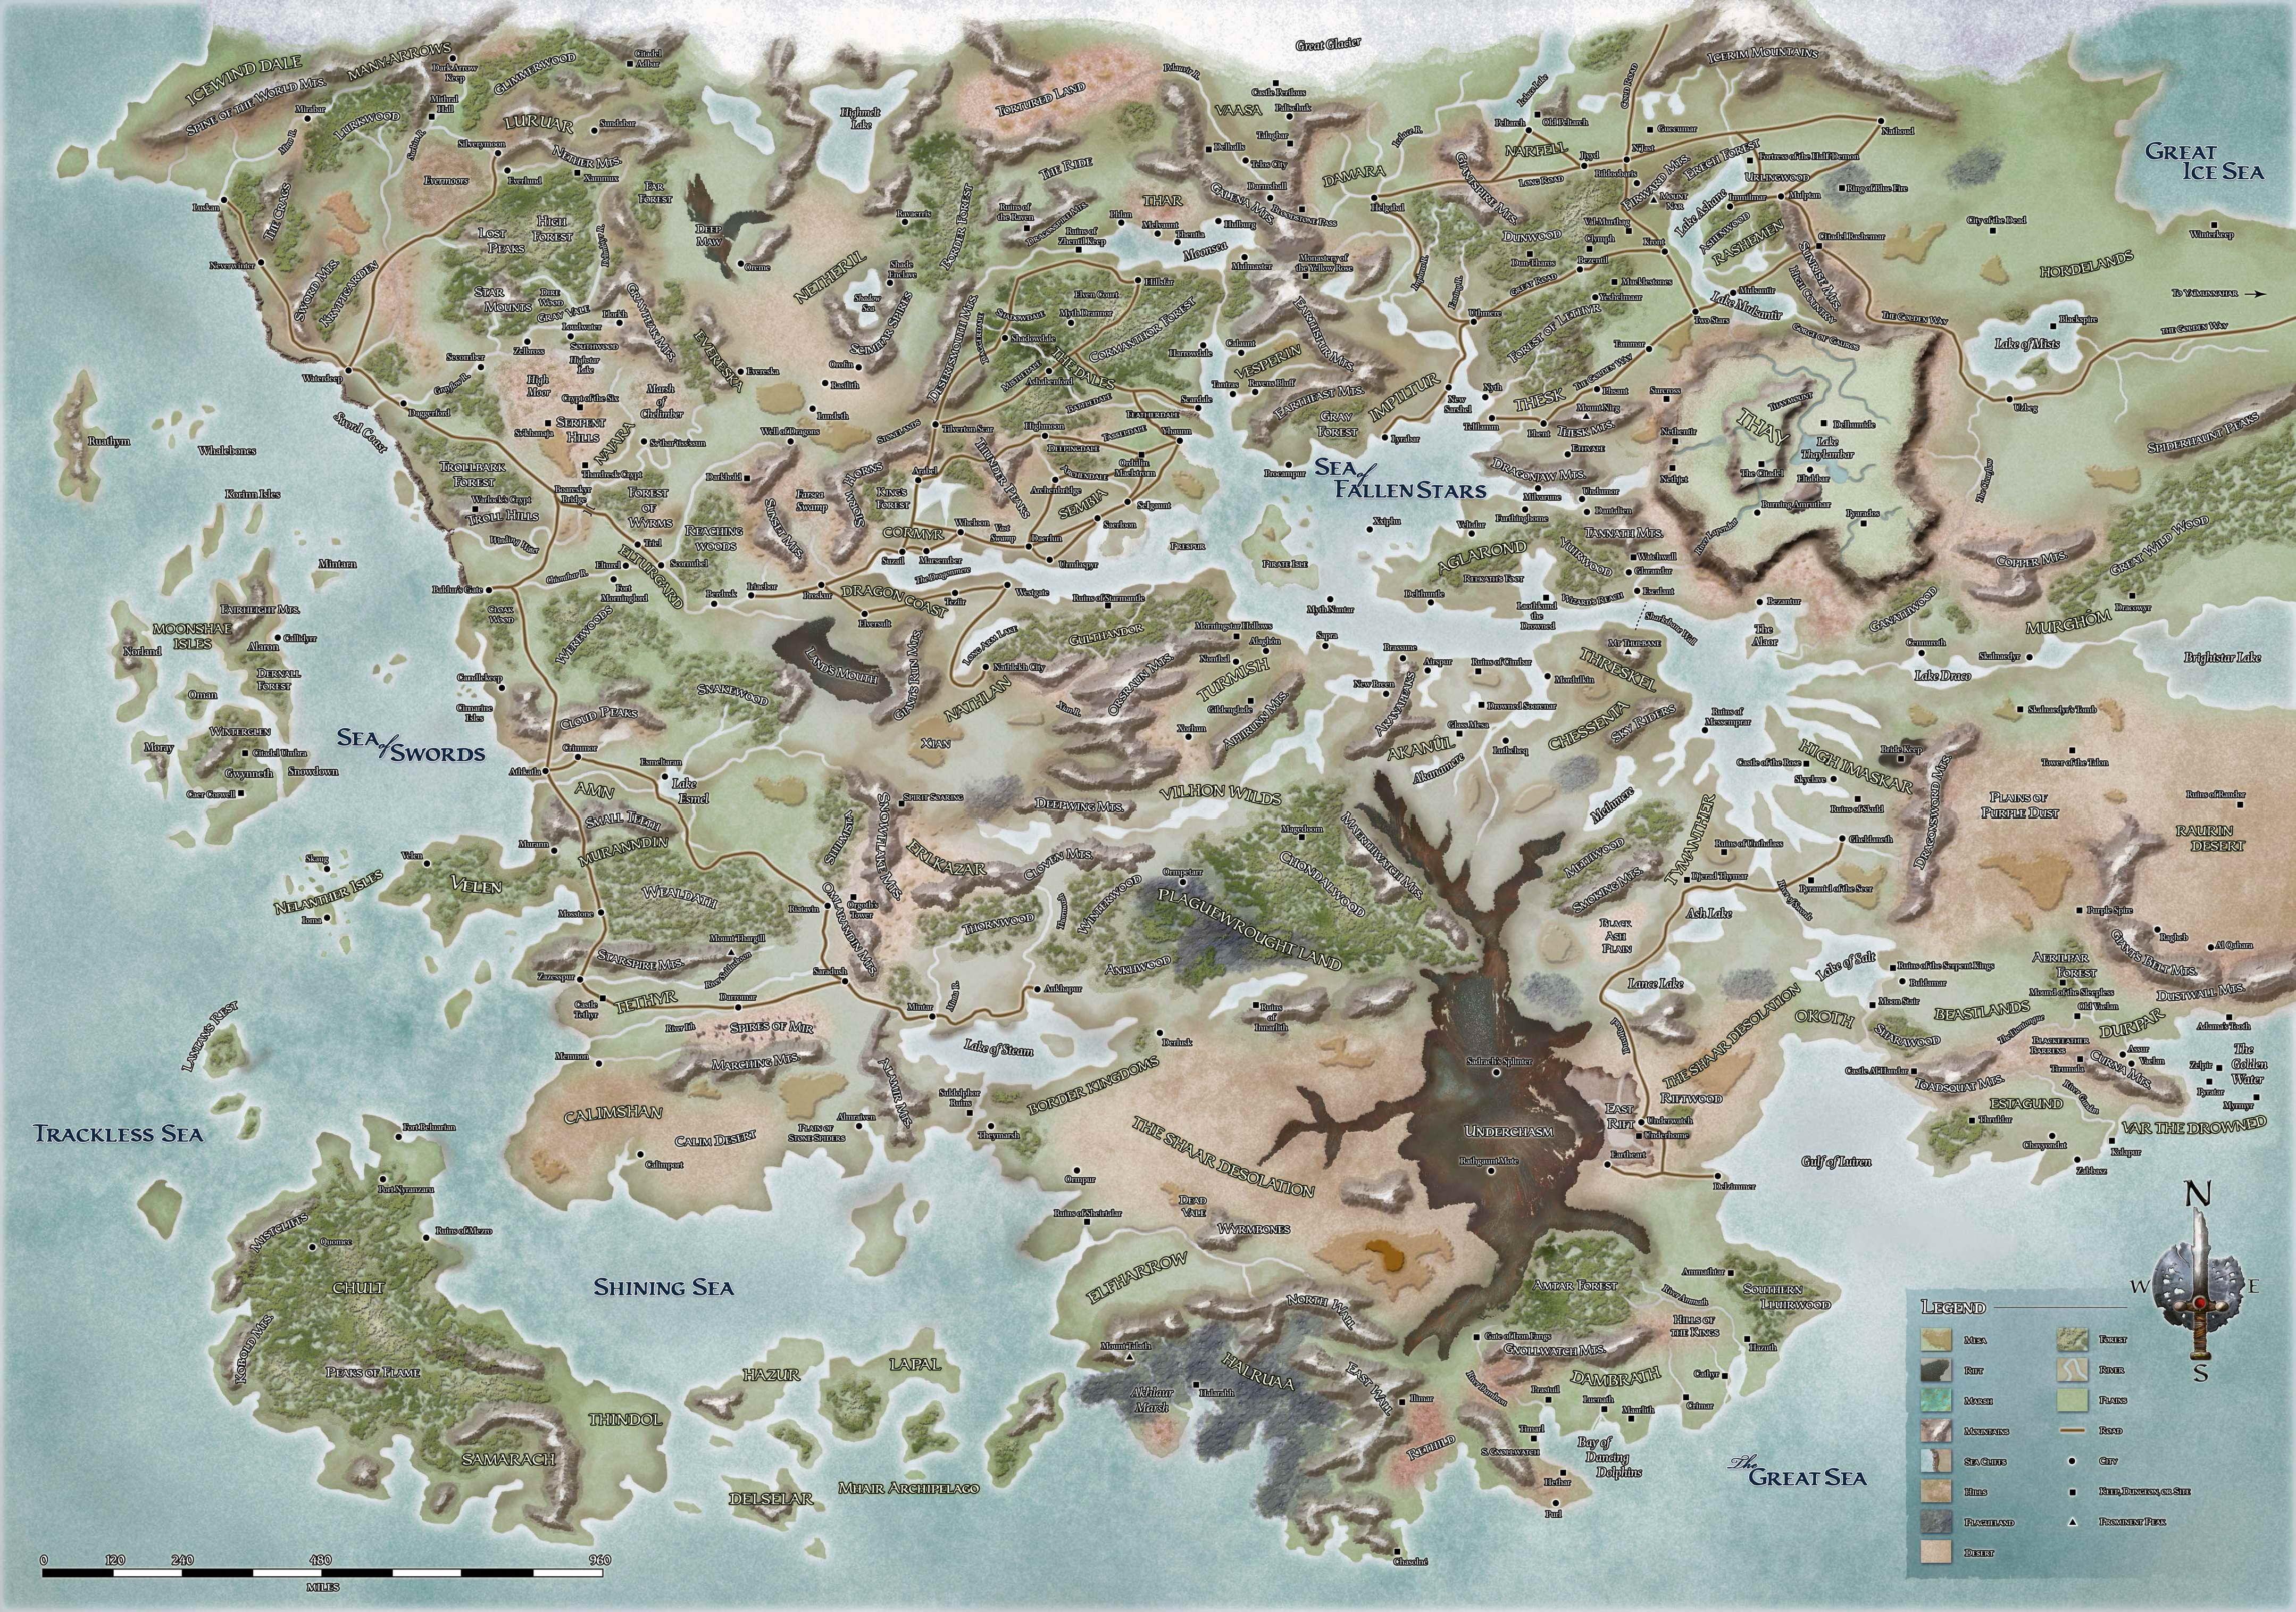 Neverwinter Saga: Gauntlgrym Bk. 1 by R. A. Salvatore (2010, Hardcover)